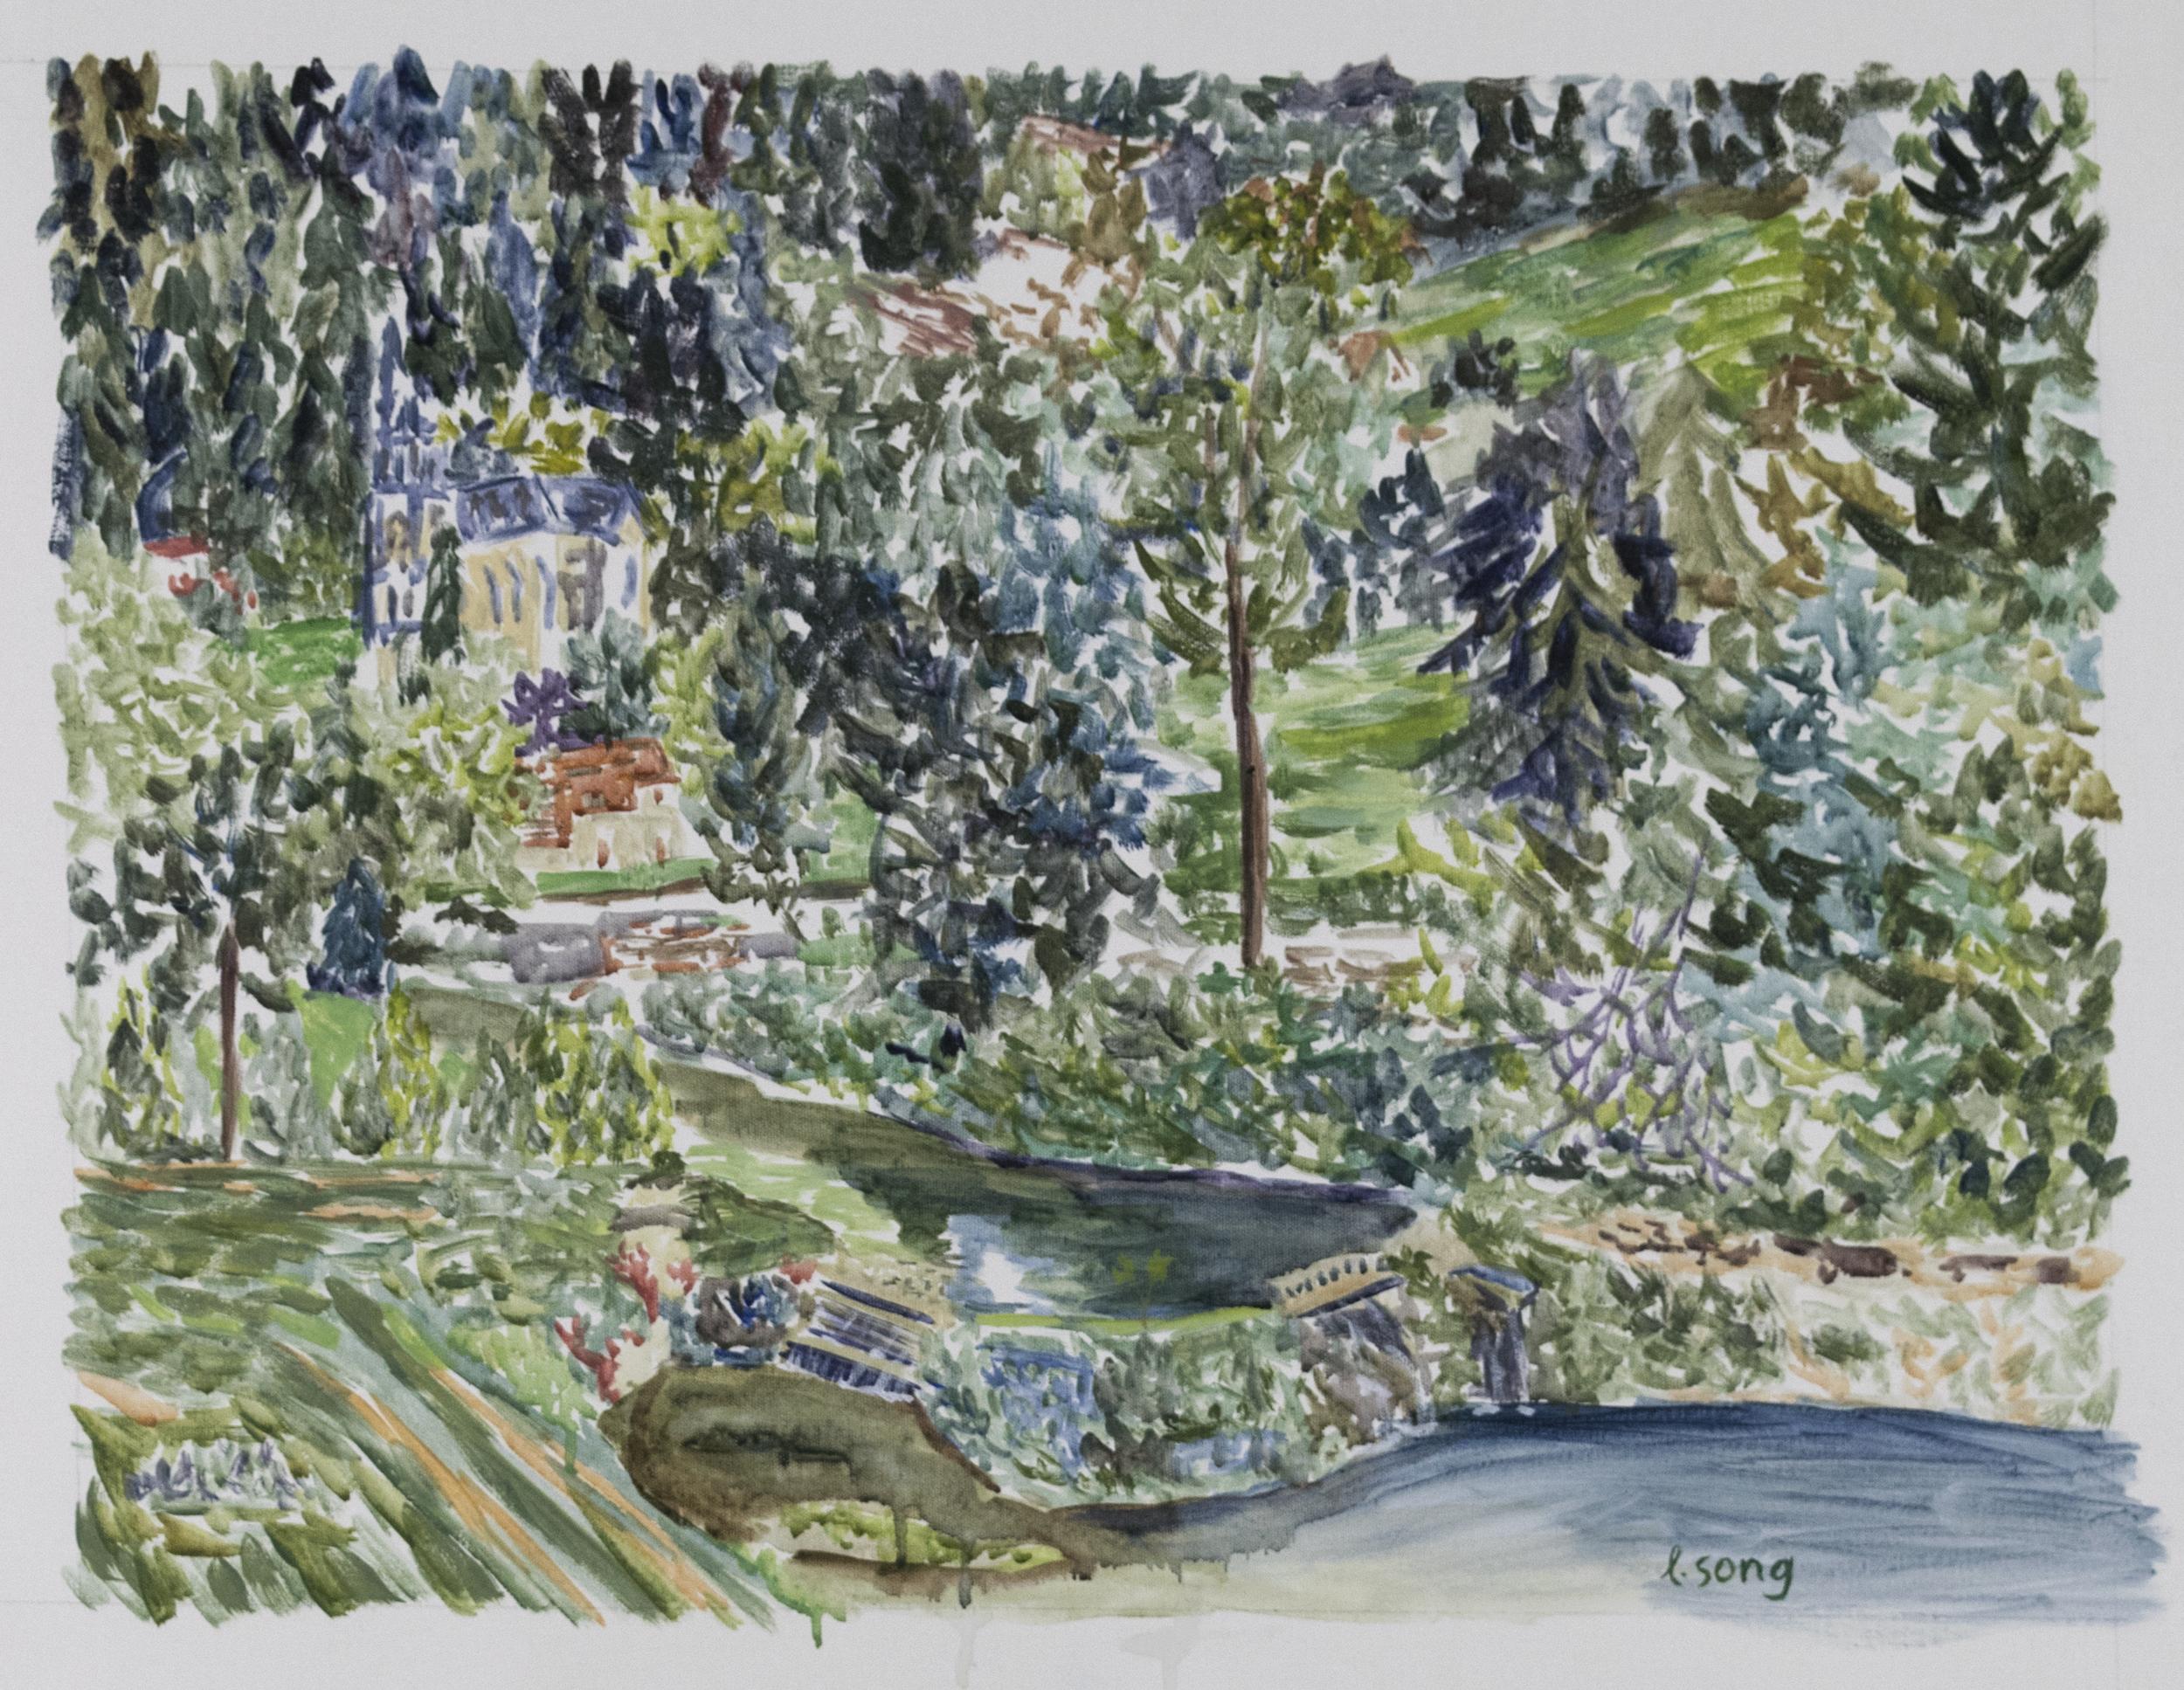 "Studio View No. 2 . 2018. Acrylic on canvas. 24"" x 18""."